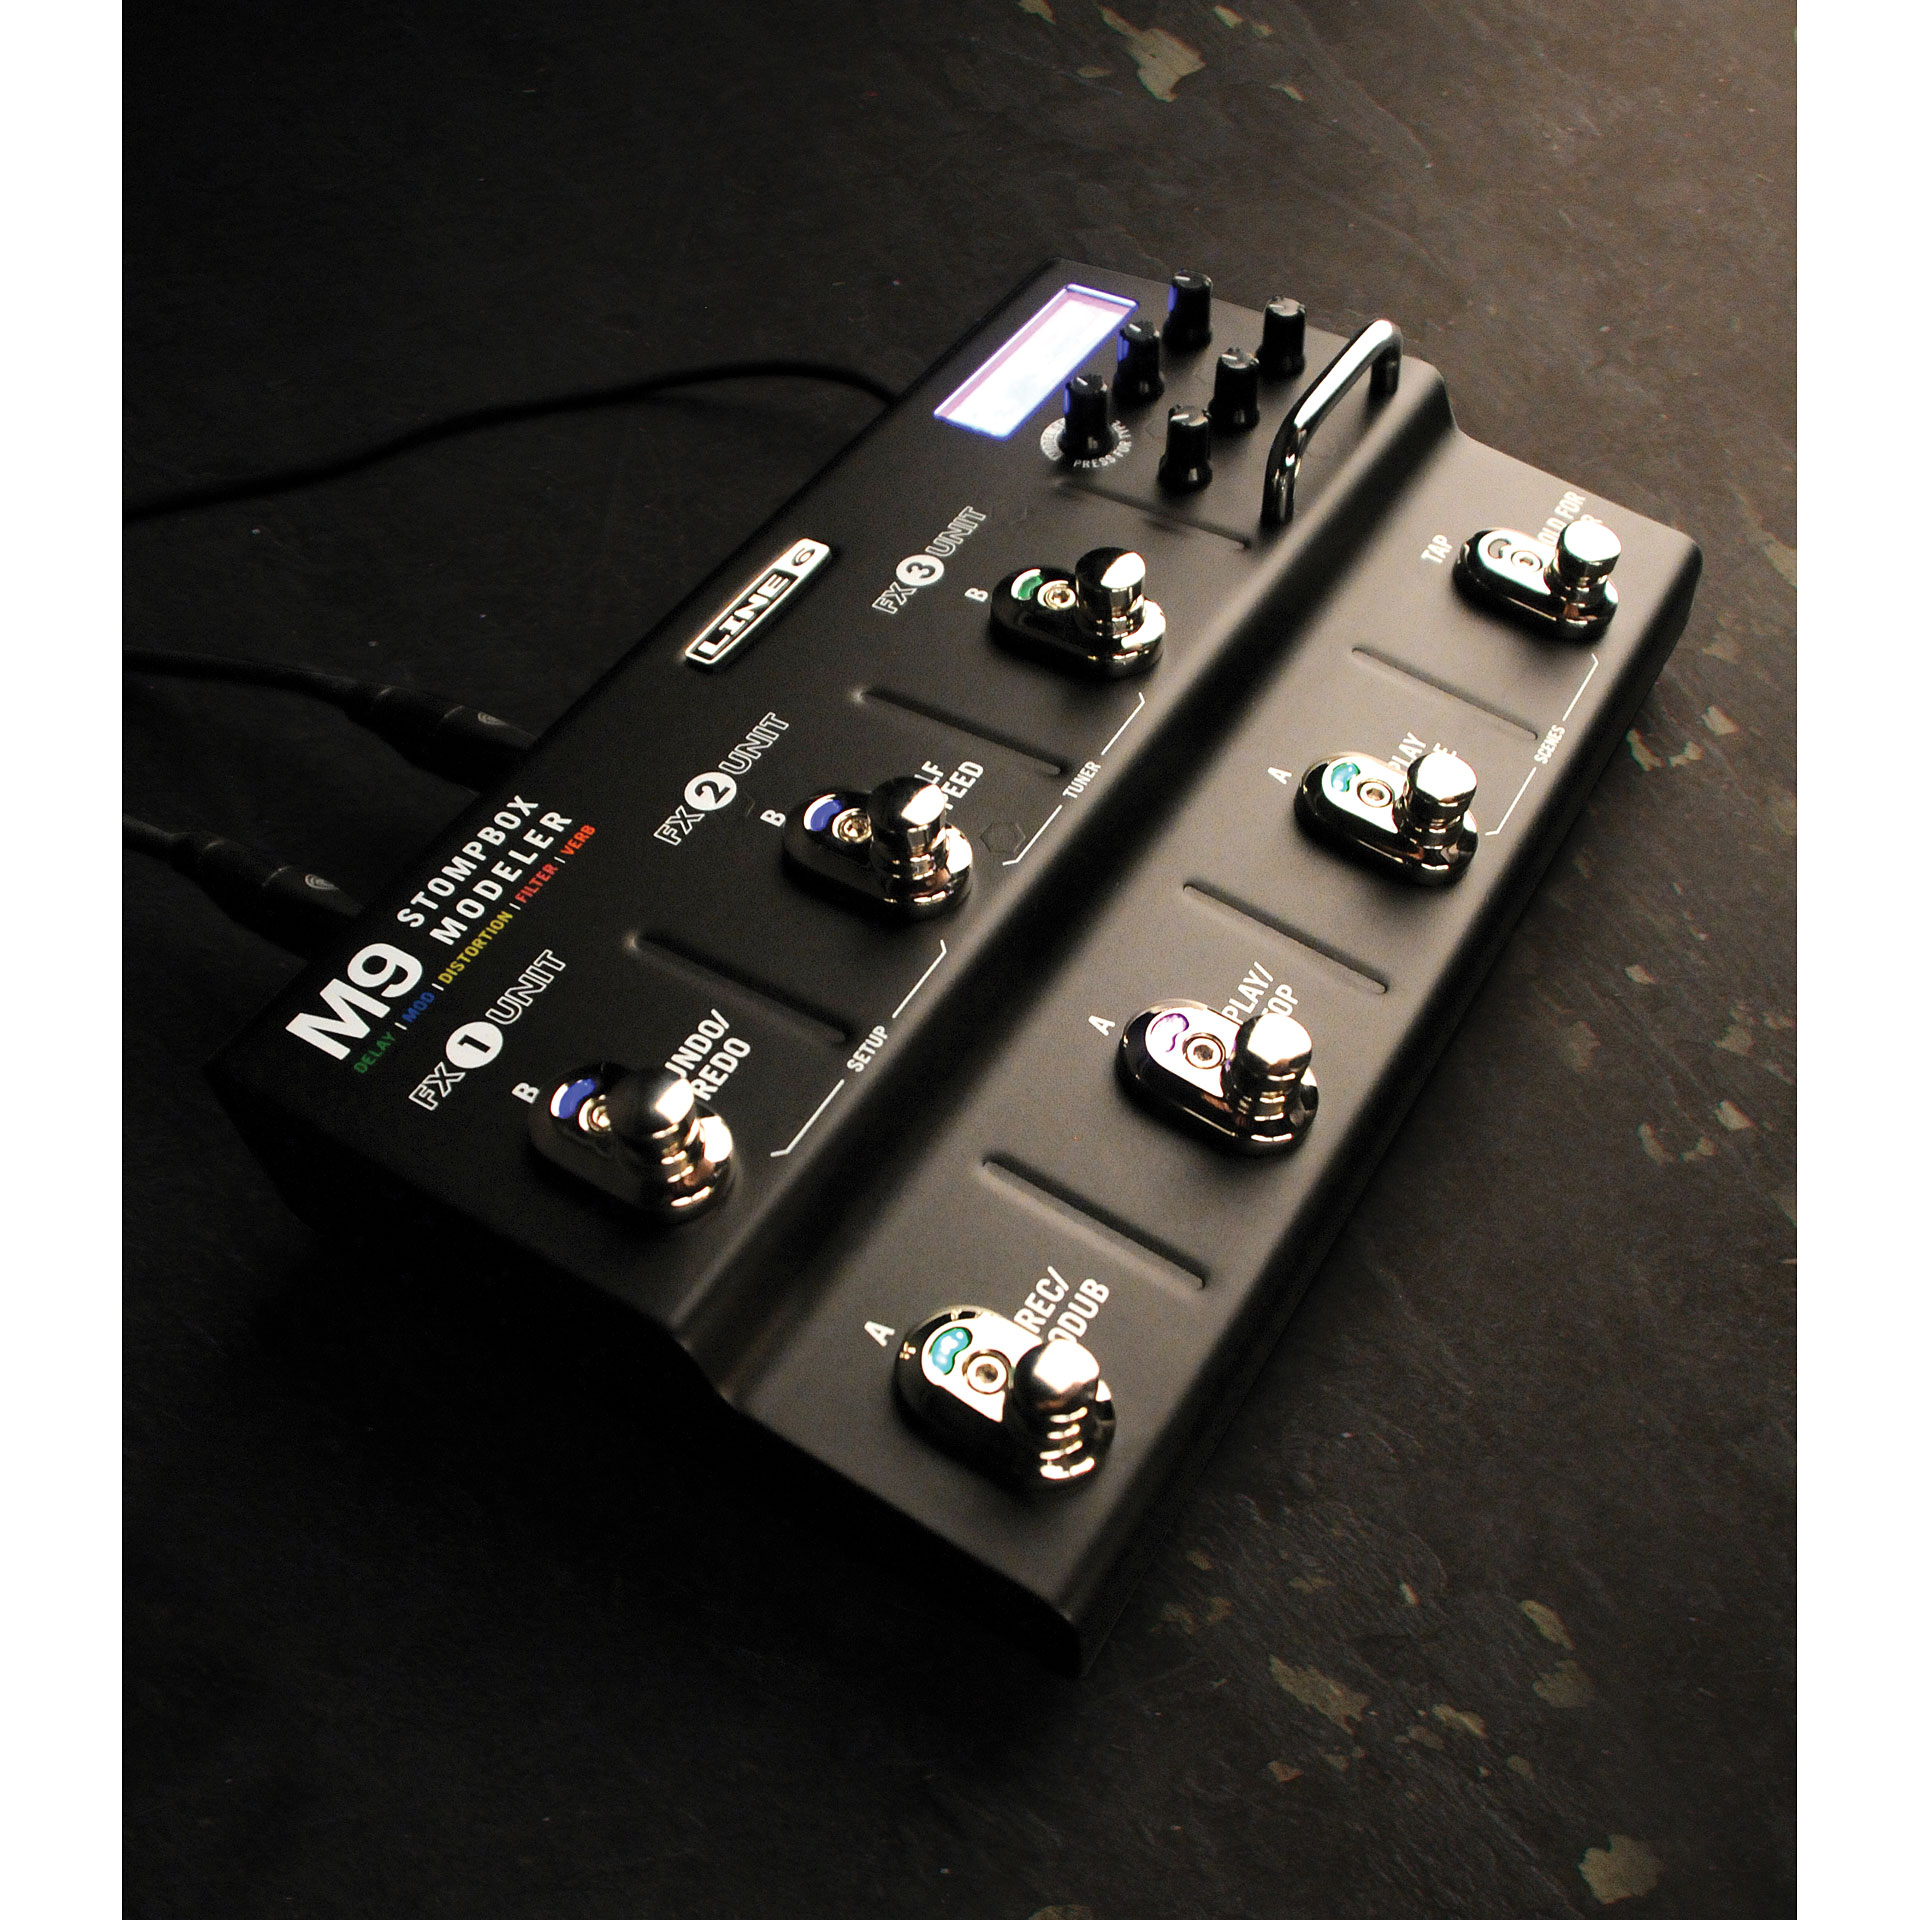 line 6 m9 stompbox modeler 10102606 multi effets guitare lectrique. Black Bedroom Furniture Sets. Home Design Ideas